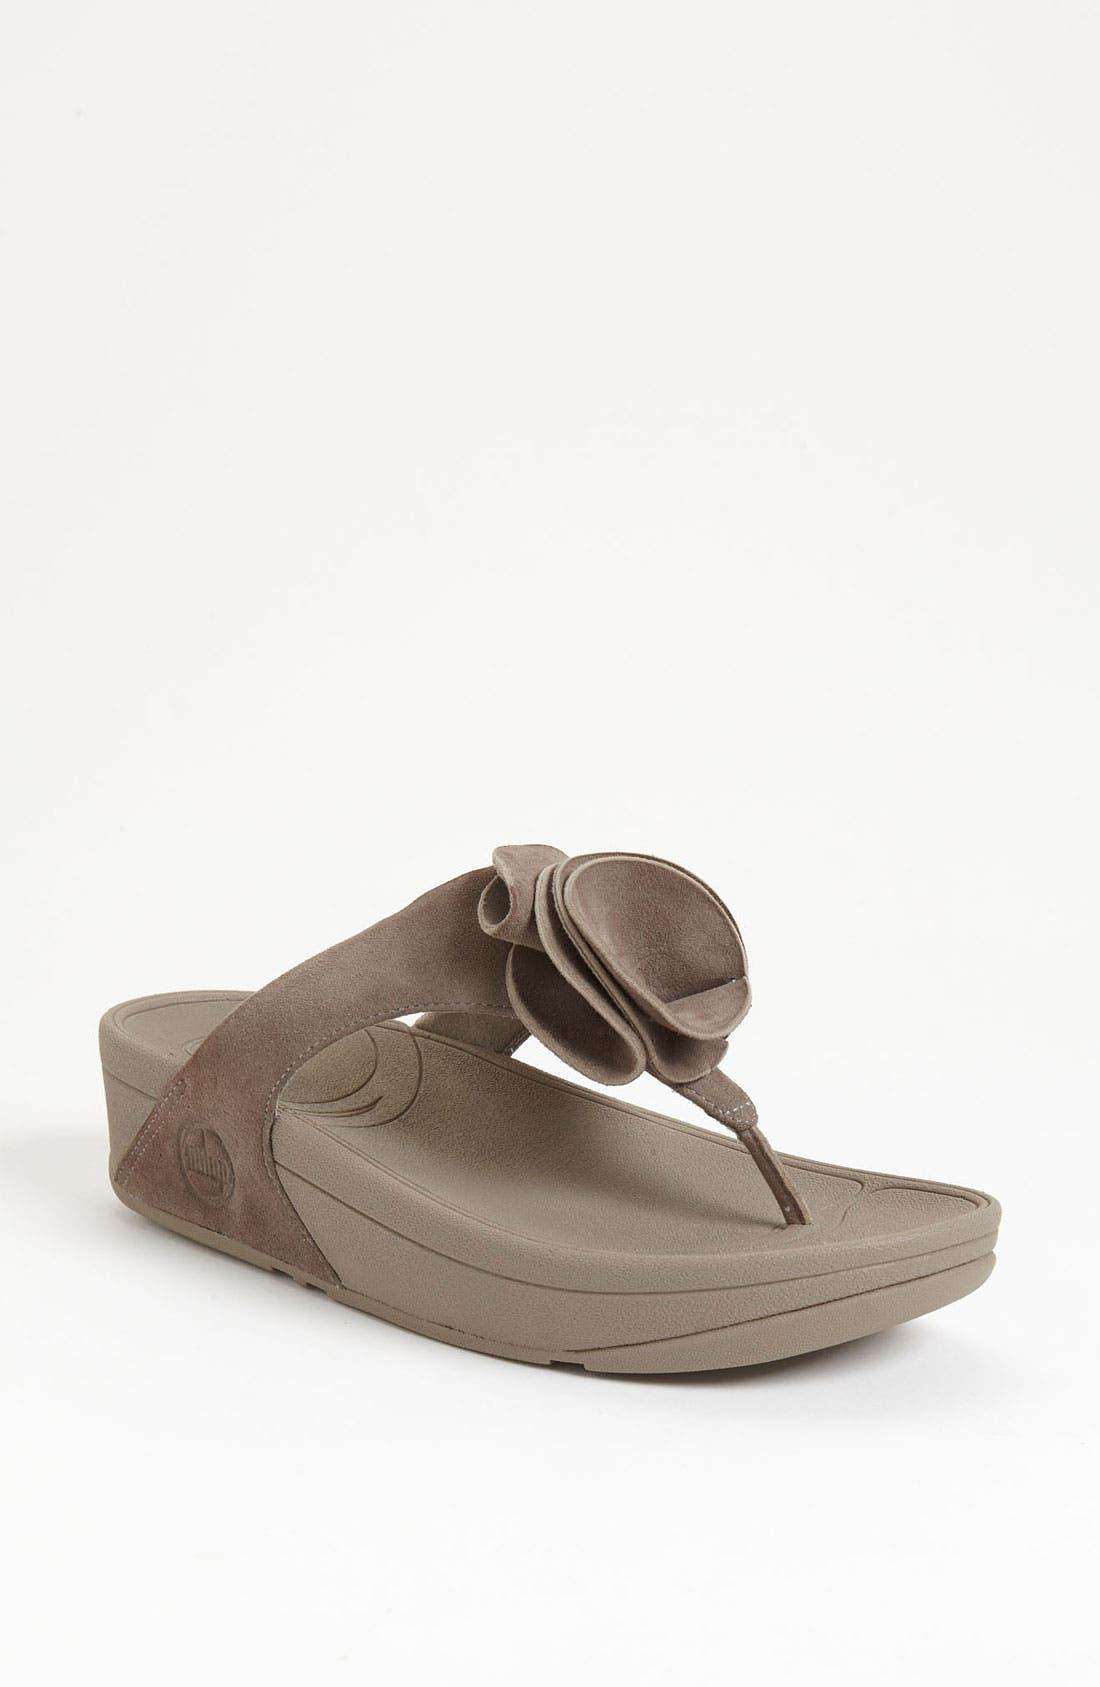 Alternate Image 1 Selected - FitFlop Sandal